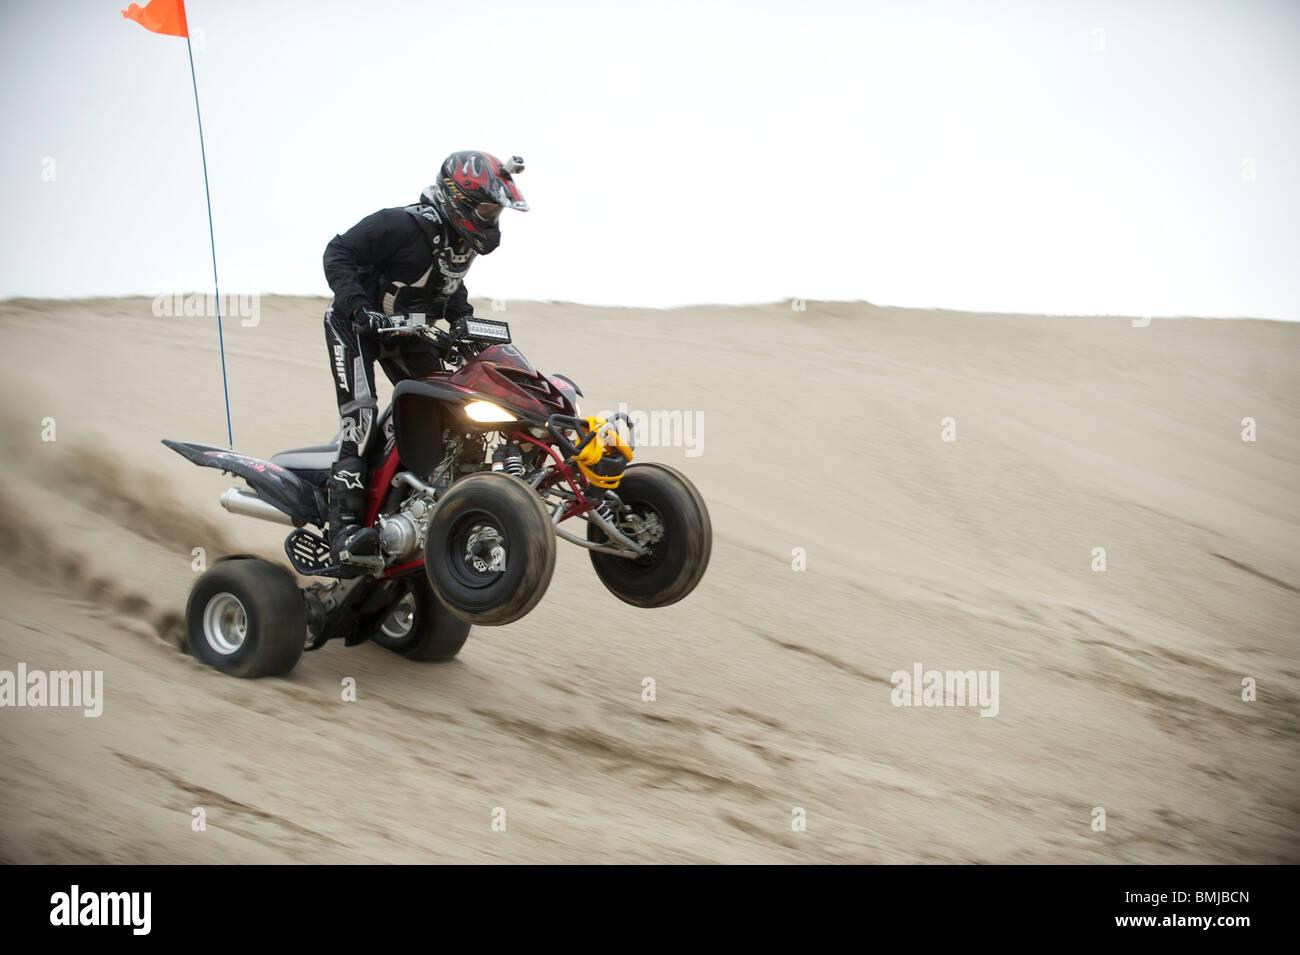 Dune Buggies Quad Bikes Atcs And Dirt Bikes Ride Through Sand